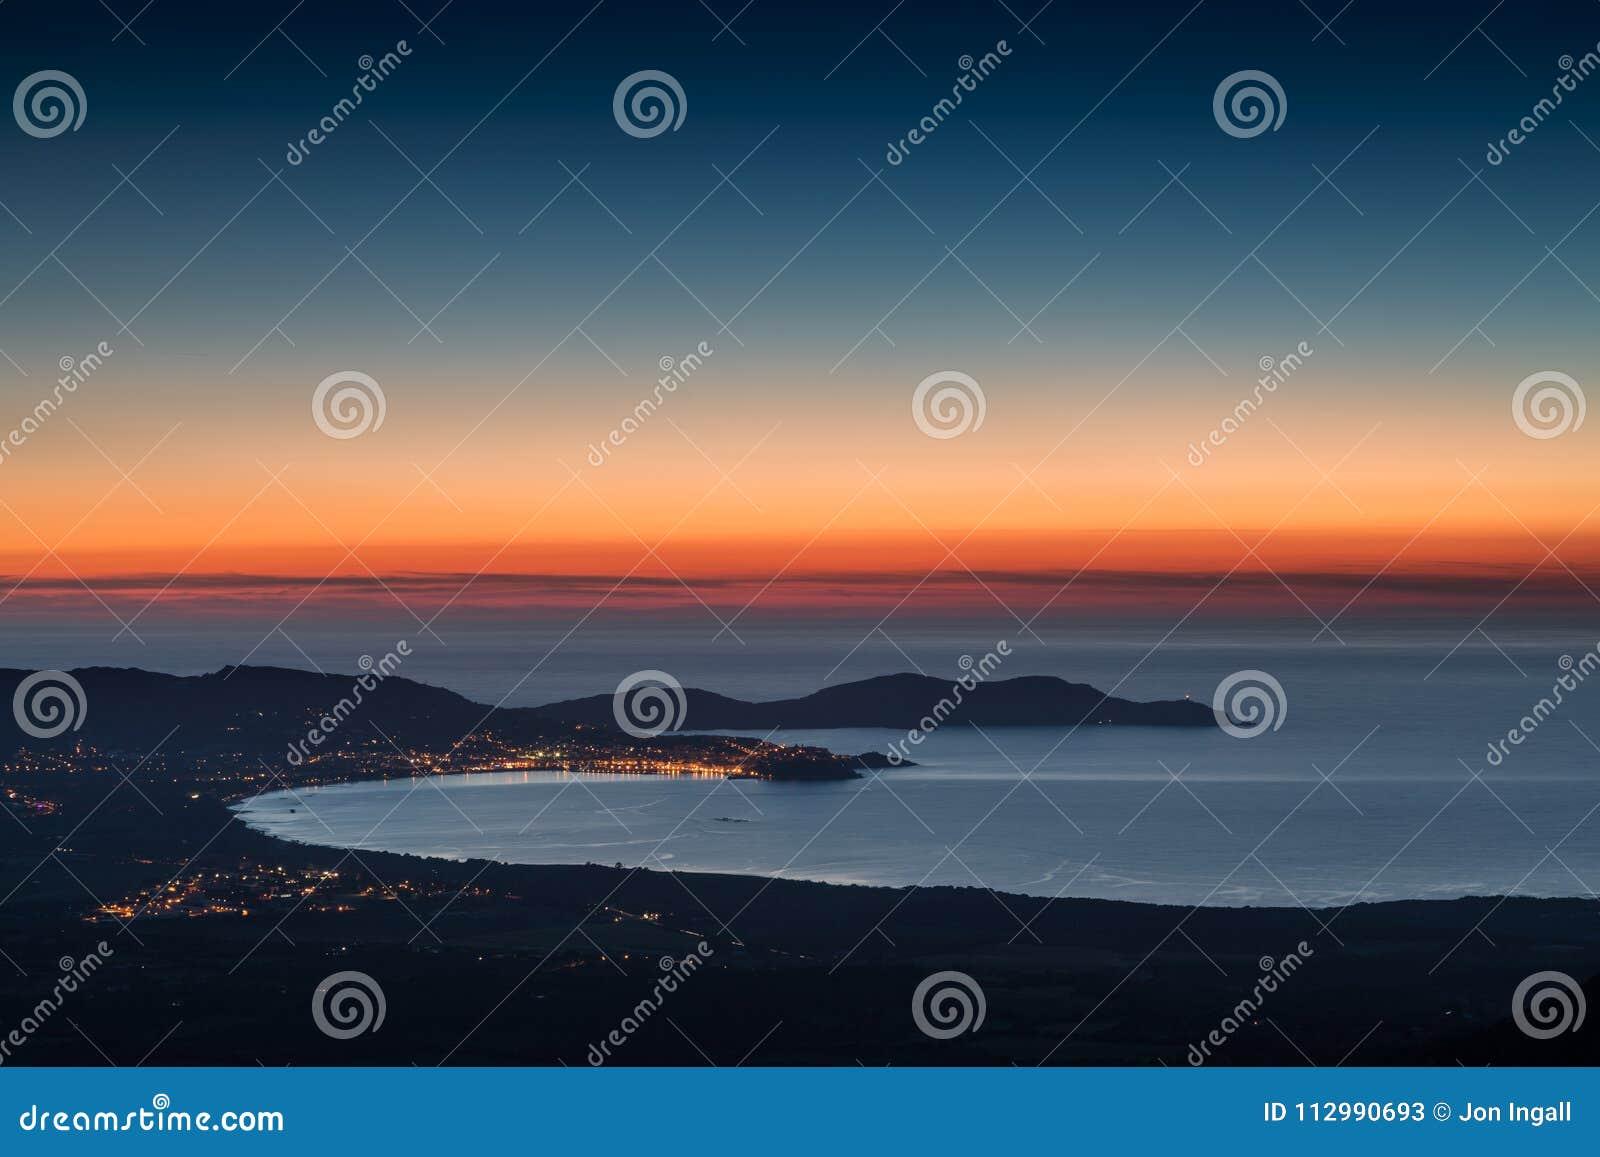 Sunset over Calvi Bay and Revellata in Corsica